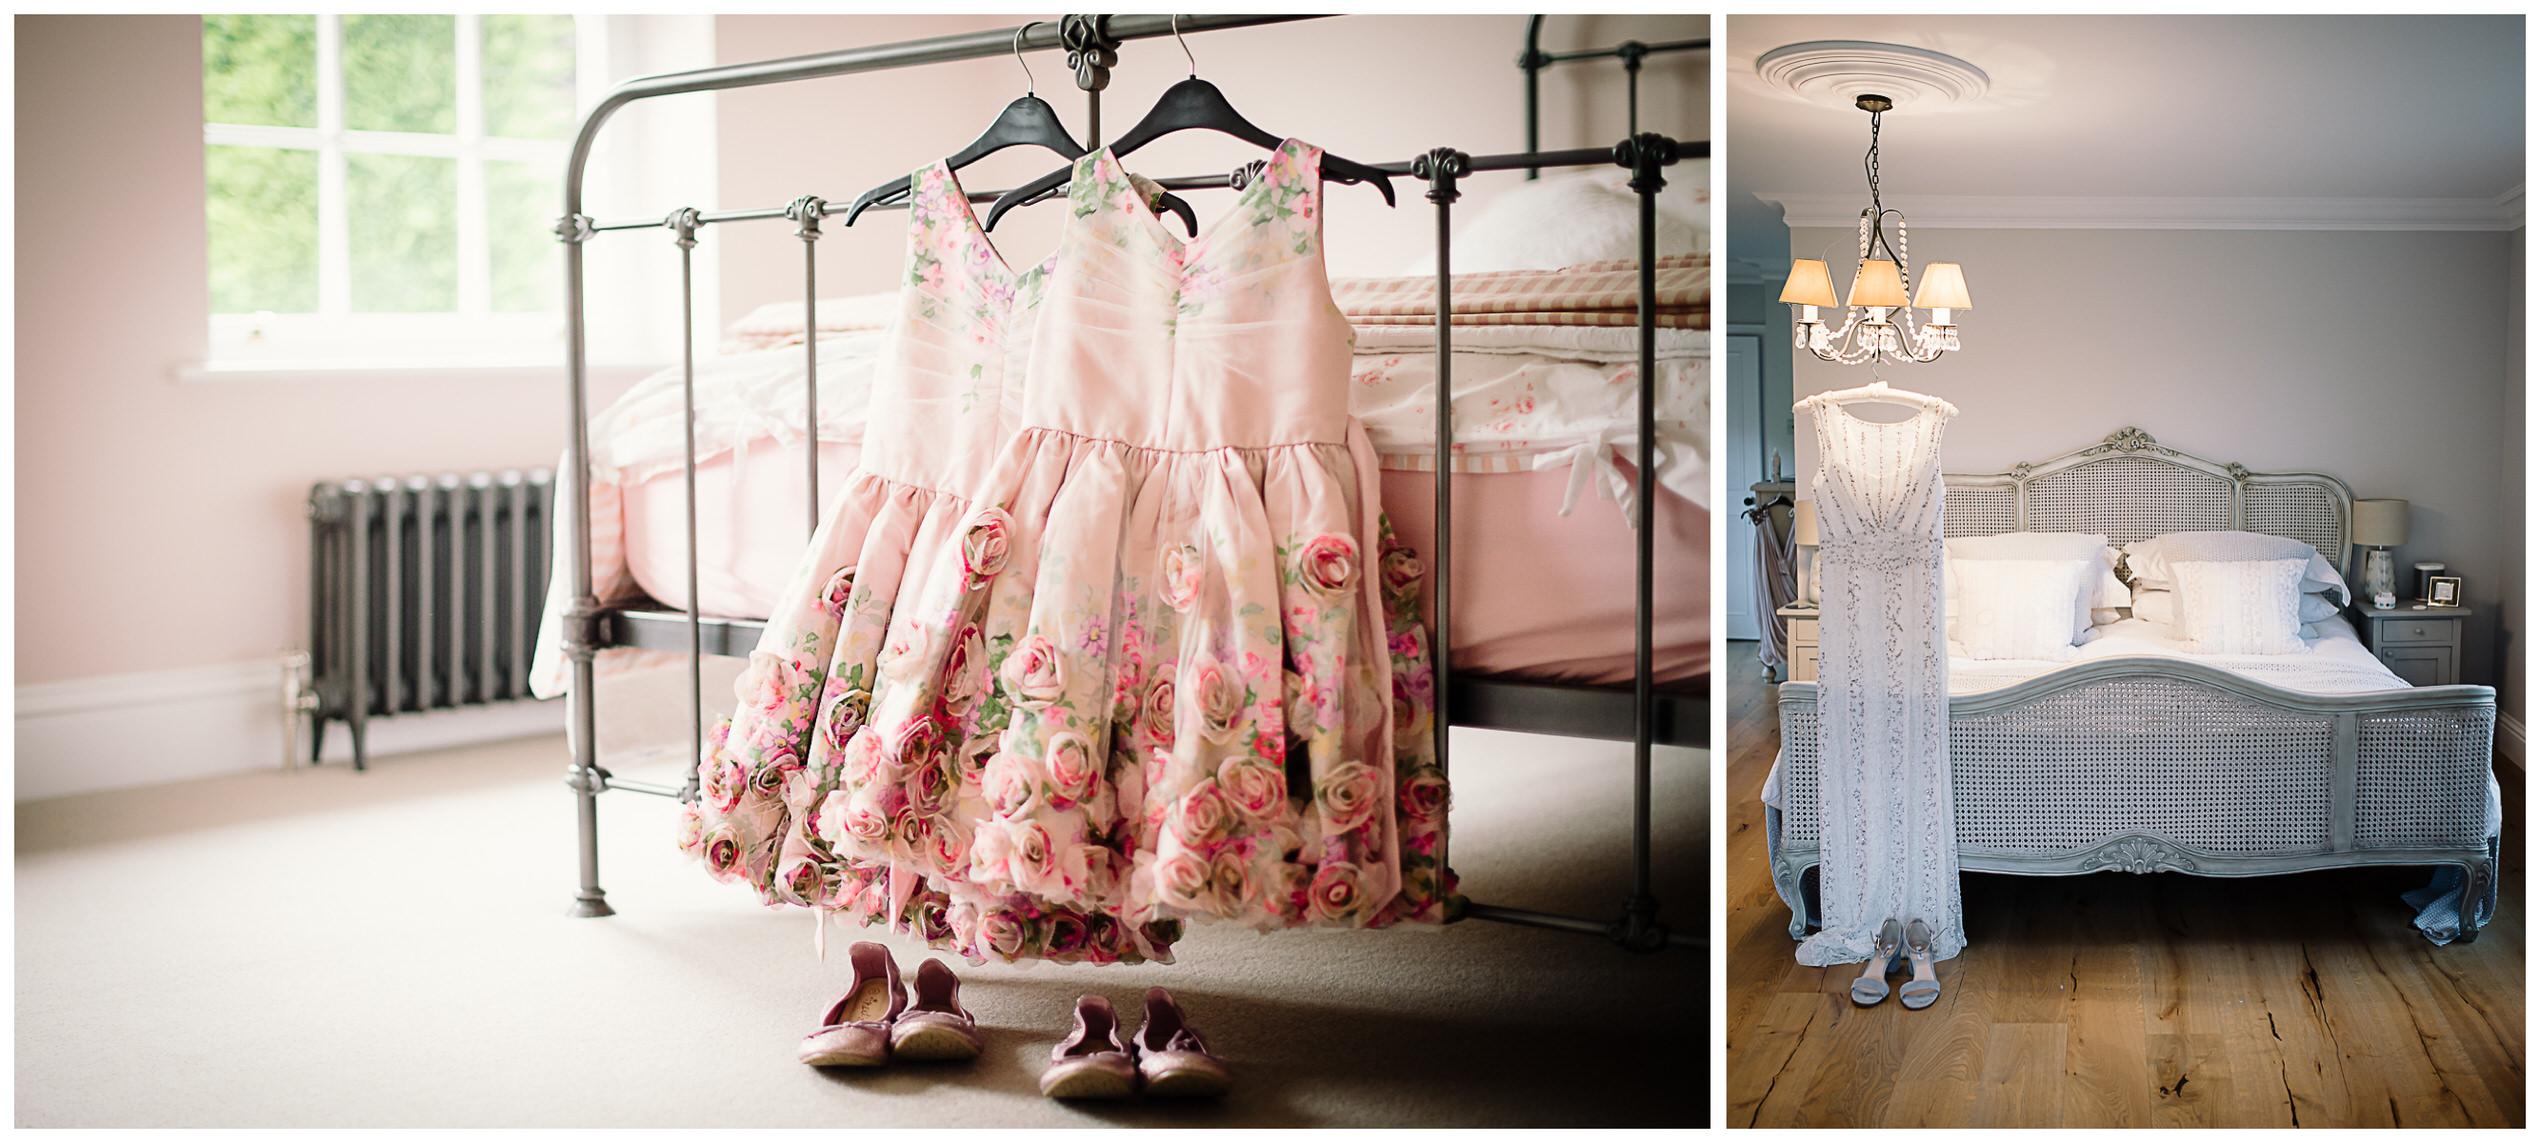 bridesmaids dresses hang up waiting to be worn at tewin bury farm hotel wedding